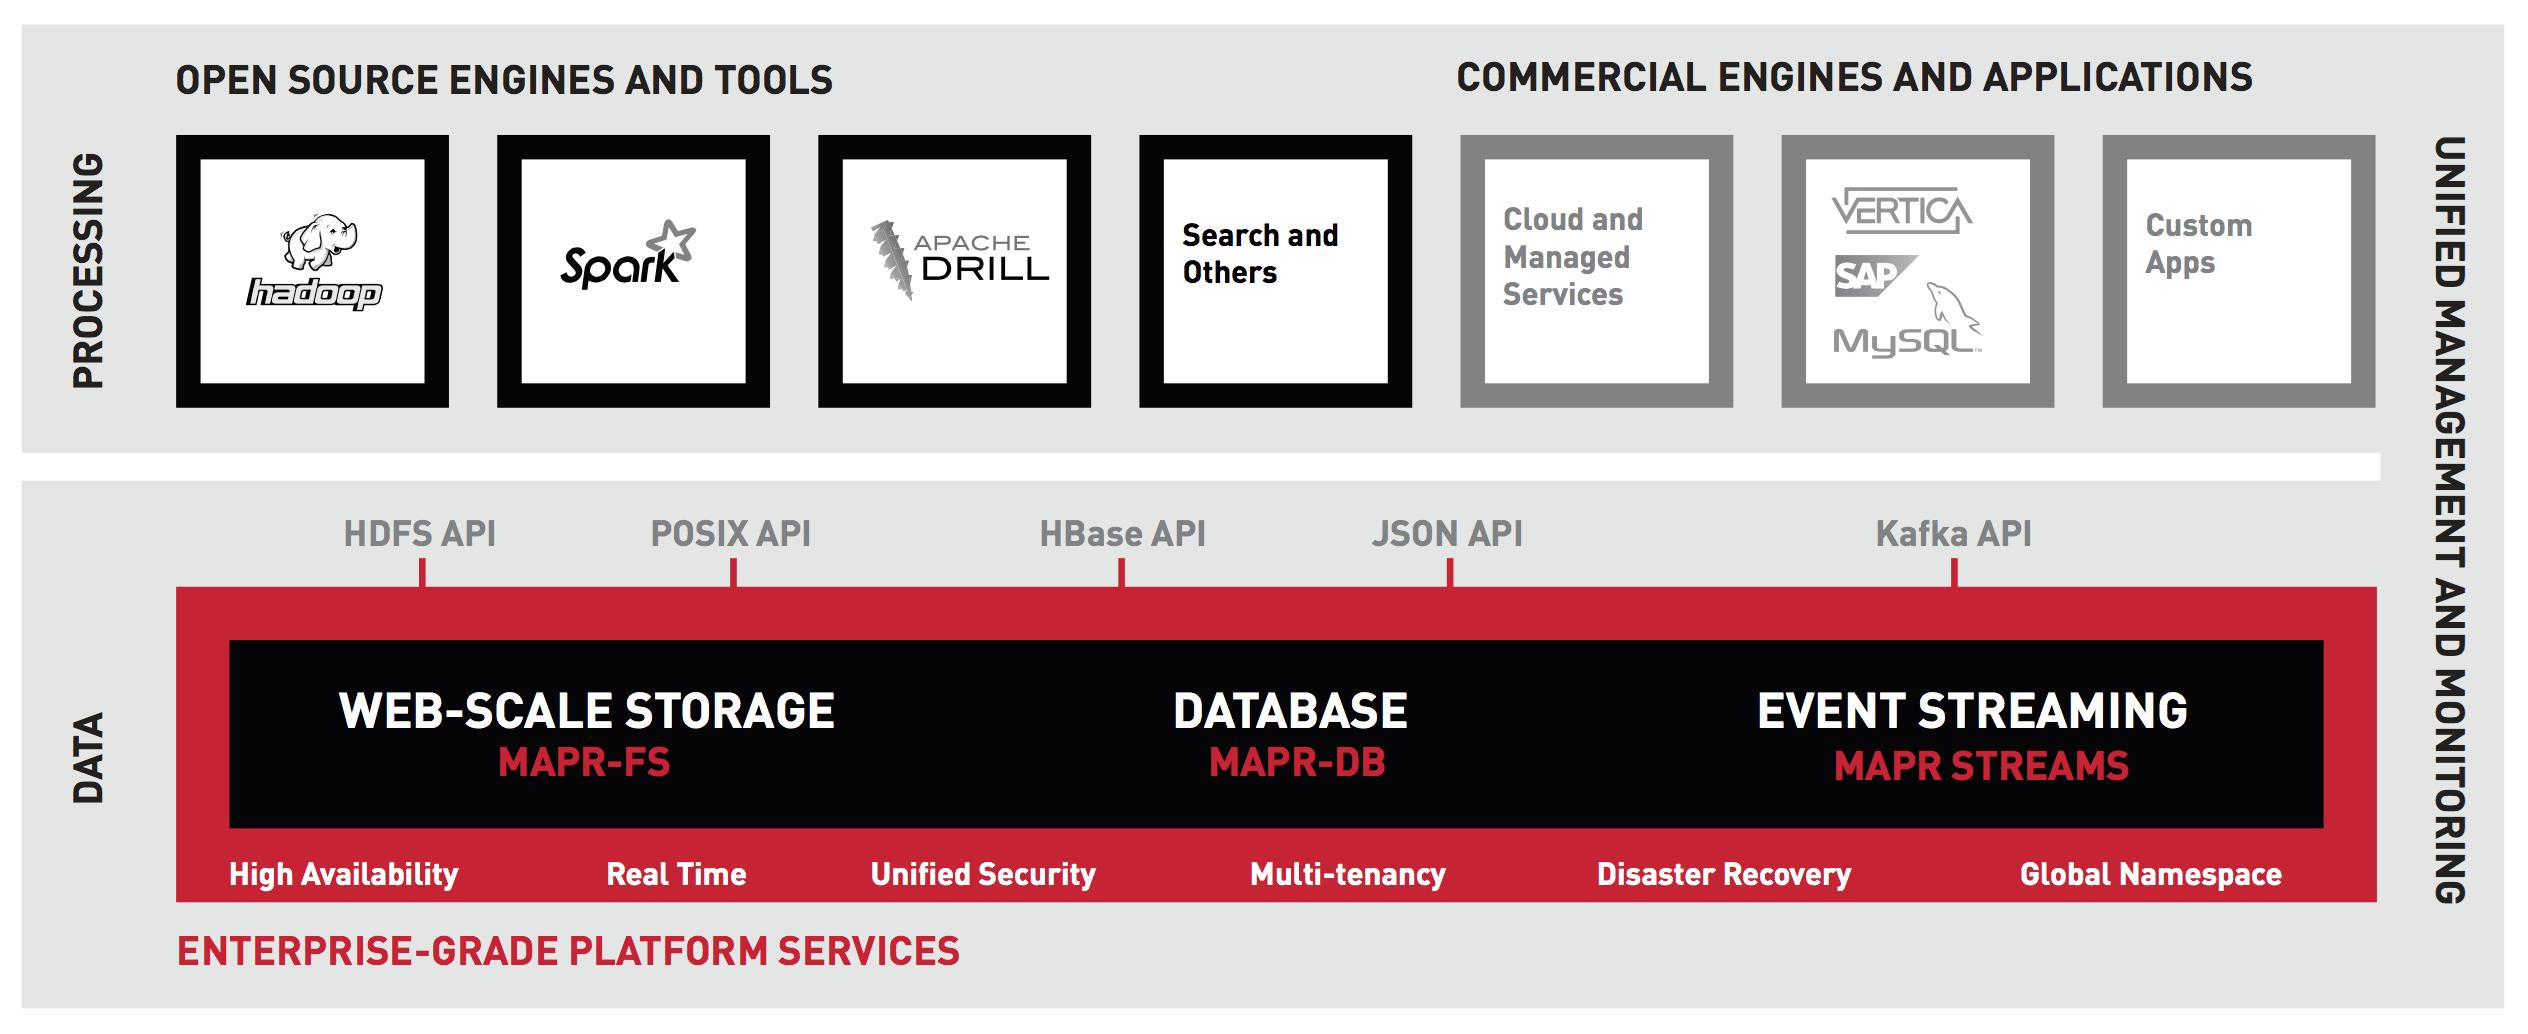 MapR Converged Data Platform